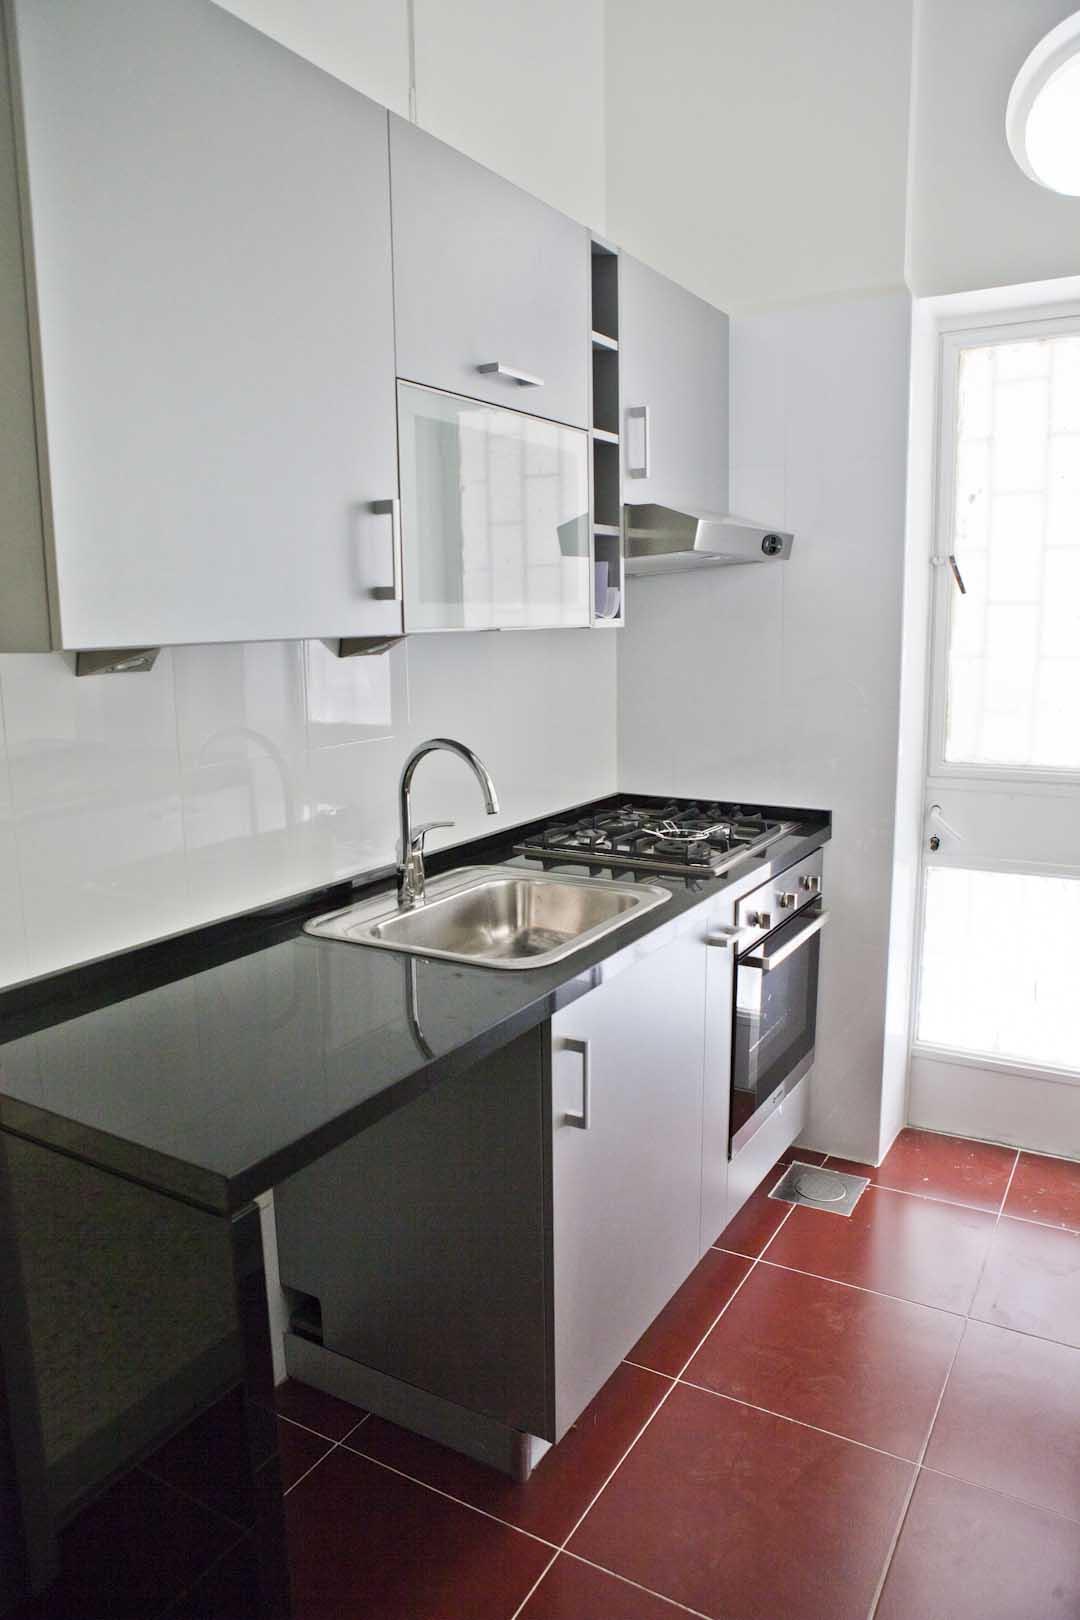 Apartment for rent - Nazareth - Achrafieh - Beirut - Lebanon